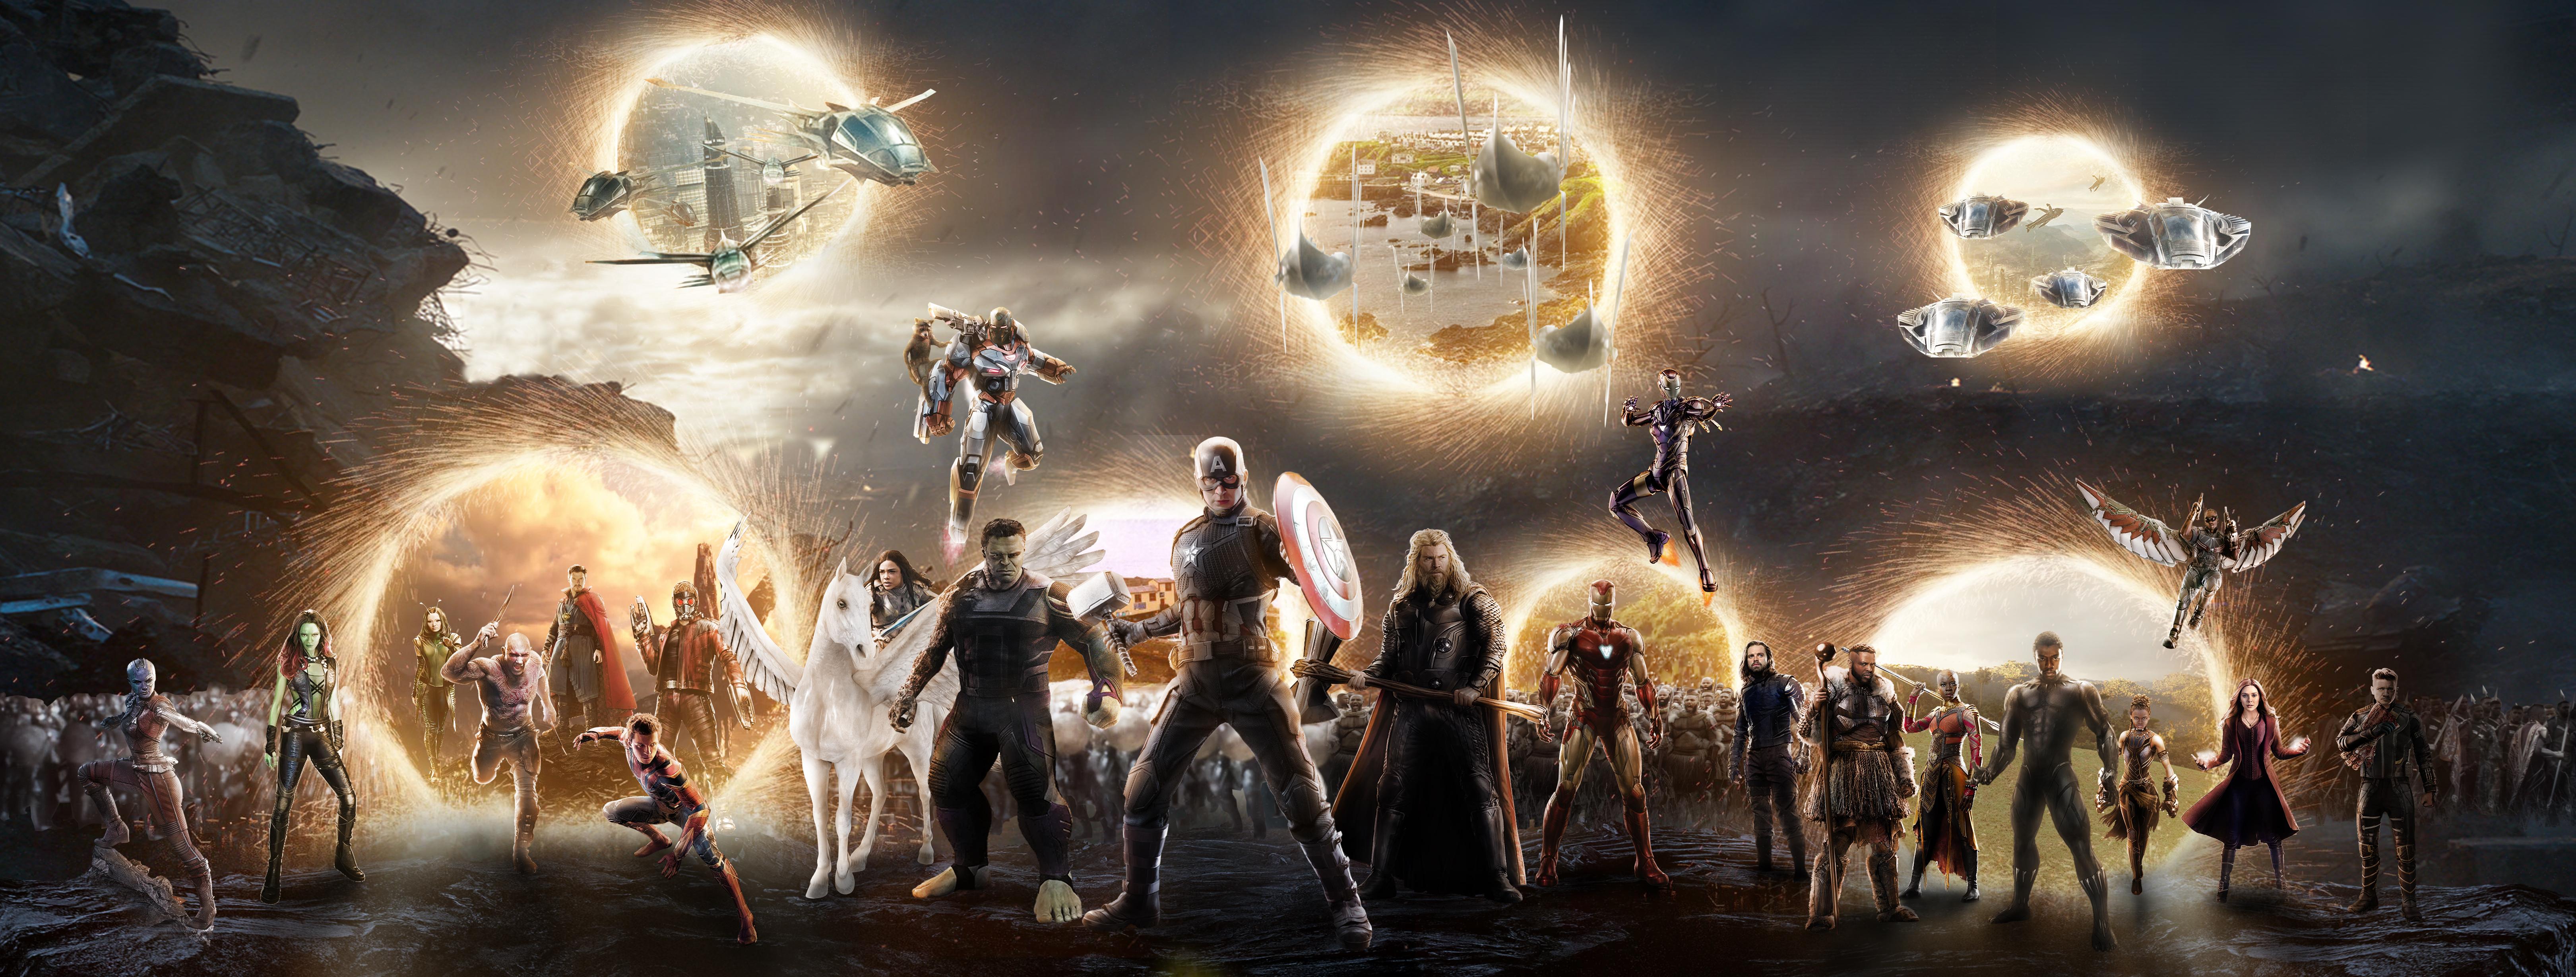 5k Avengers Endgame Final Battle Scene Hd Superheroes 4k